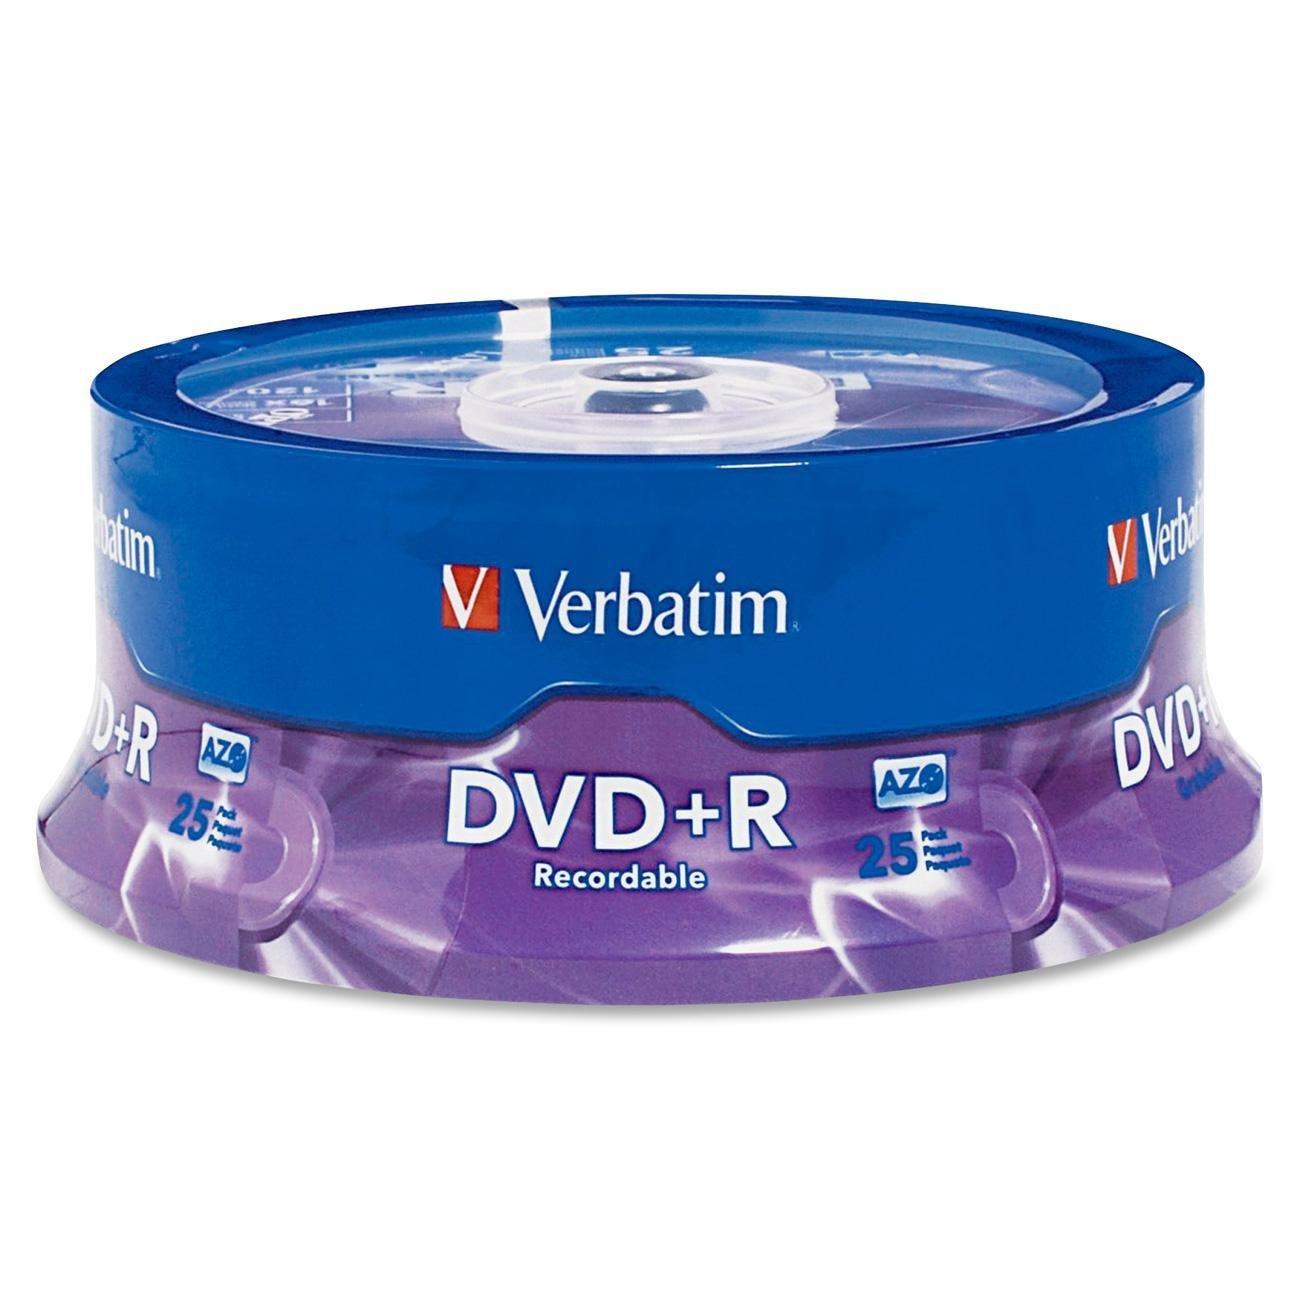 Verbatim DVD Recordable Media - DVD+R - 16x - 4.70 GB - 25 Pack Spindle - Retail